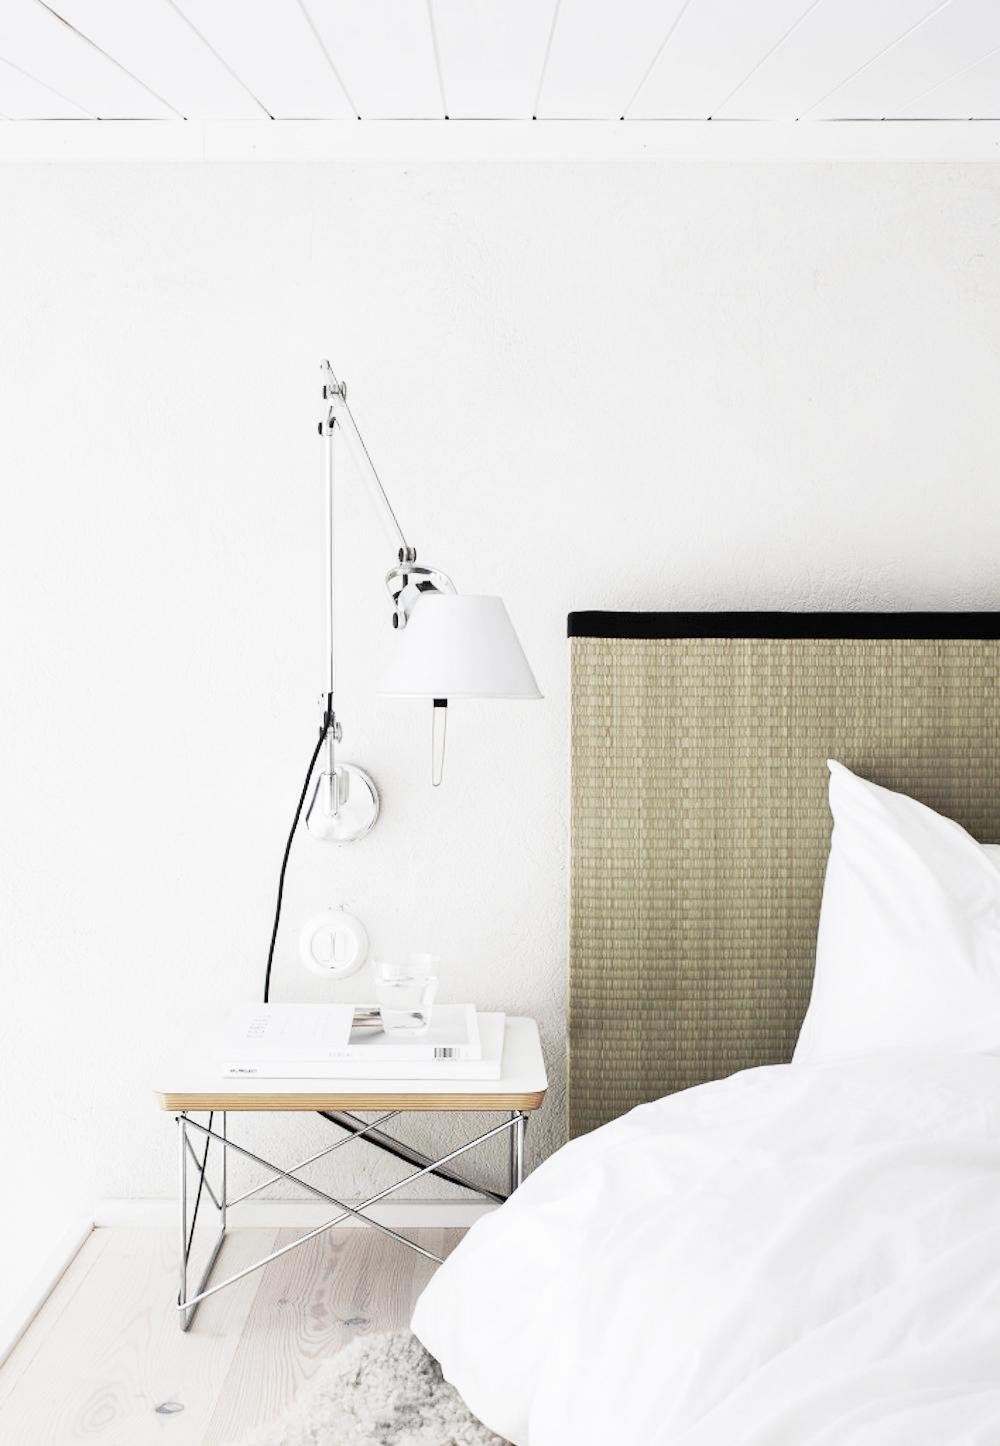 Pella Hedeby, Sara Medina Lind, Interiors, Home, Home Inspiration, Concrete Floors, Minimalist, Sunday Sanctuary, Oracle Fox